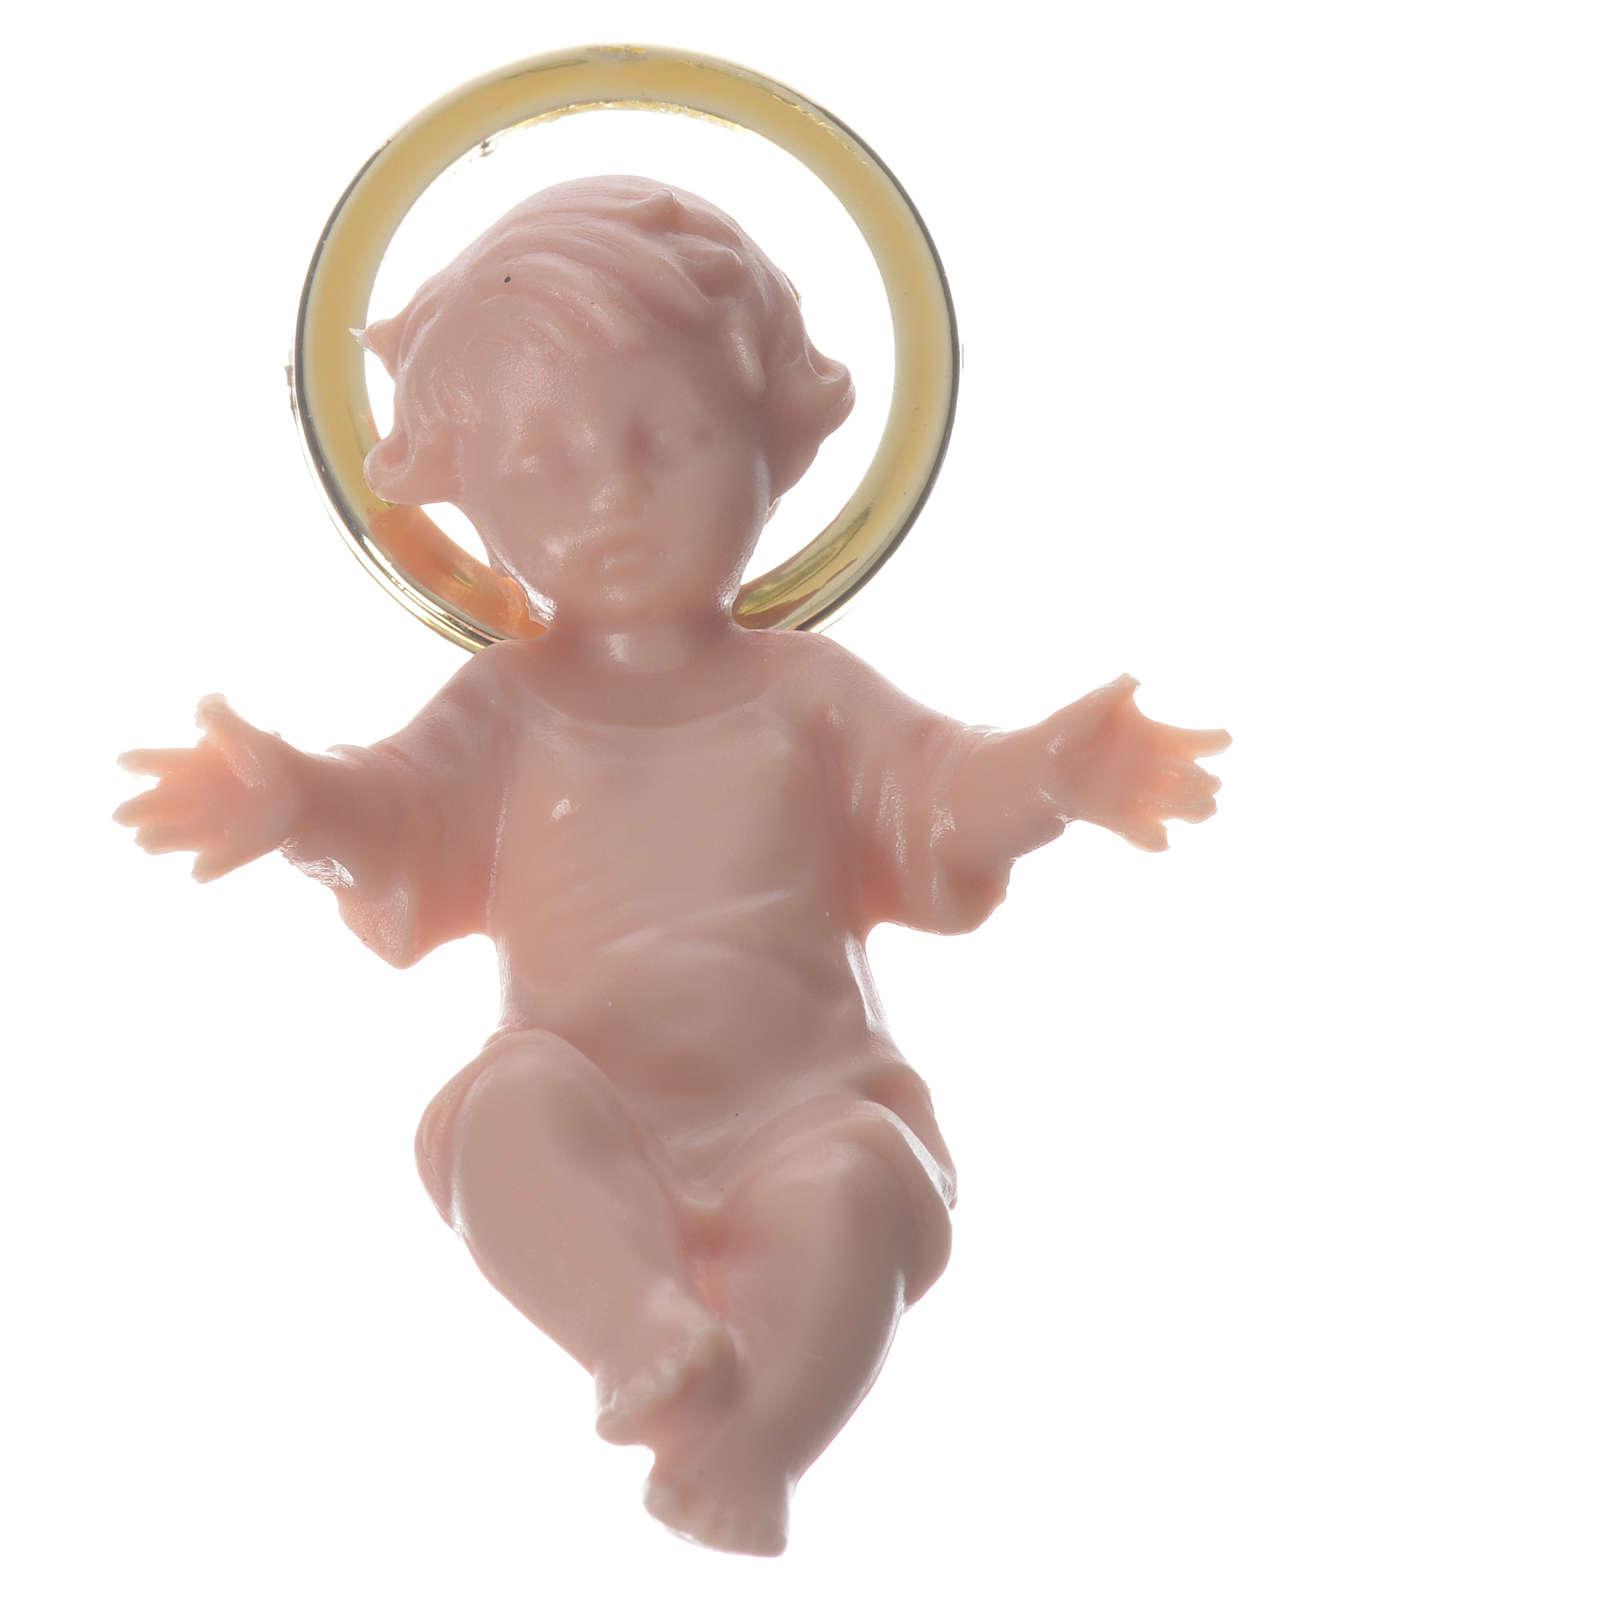 Gesù bambino 5 cm plastica aureola dorata 3